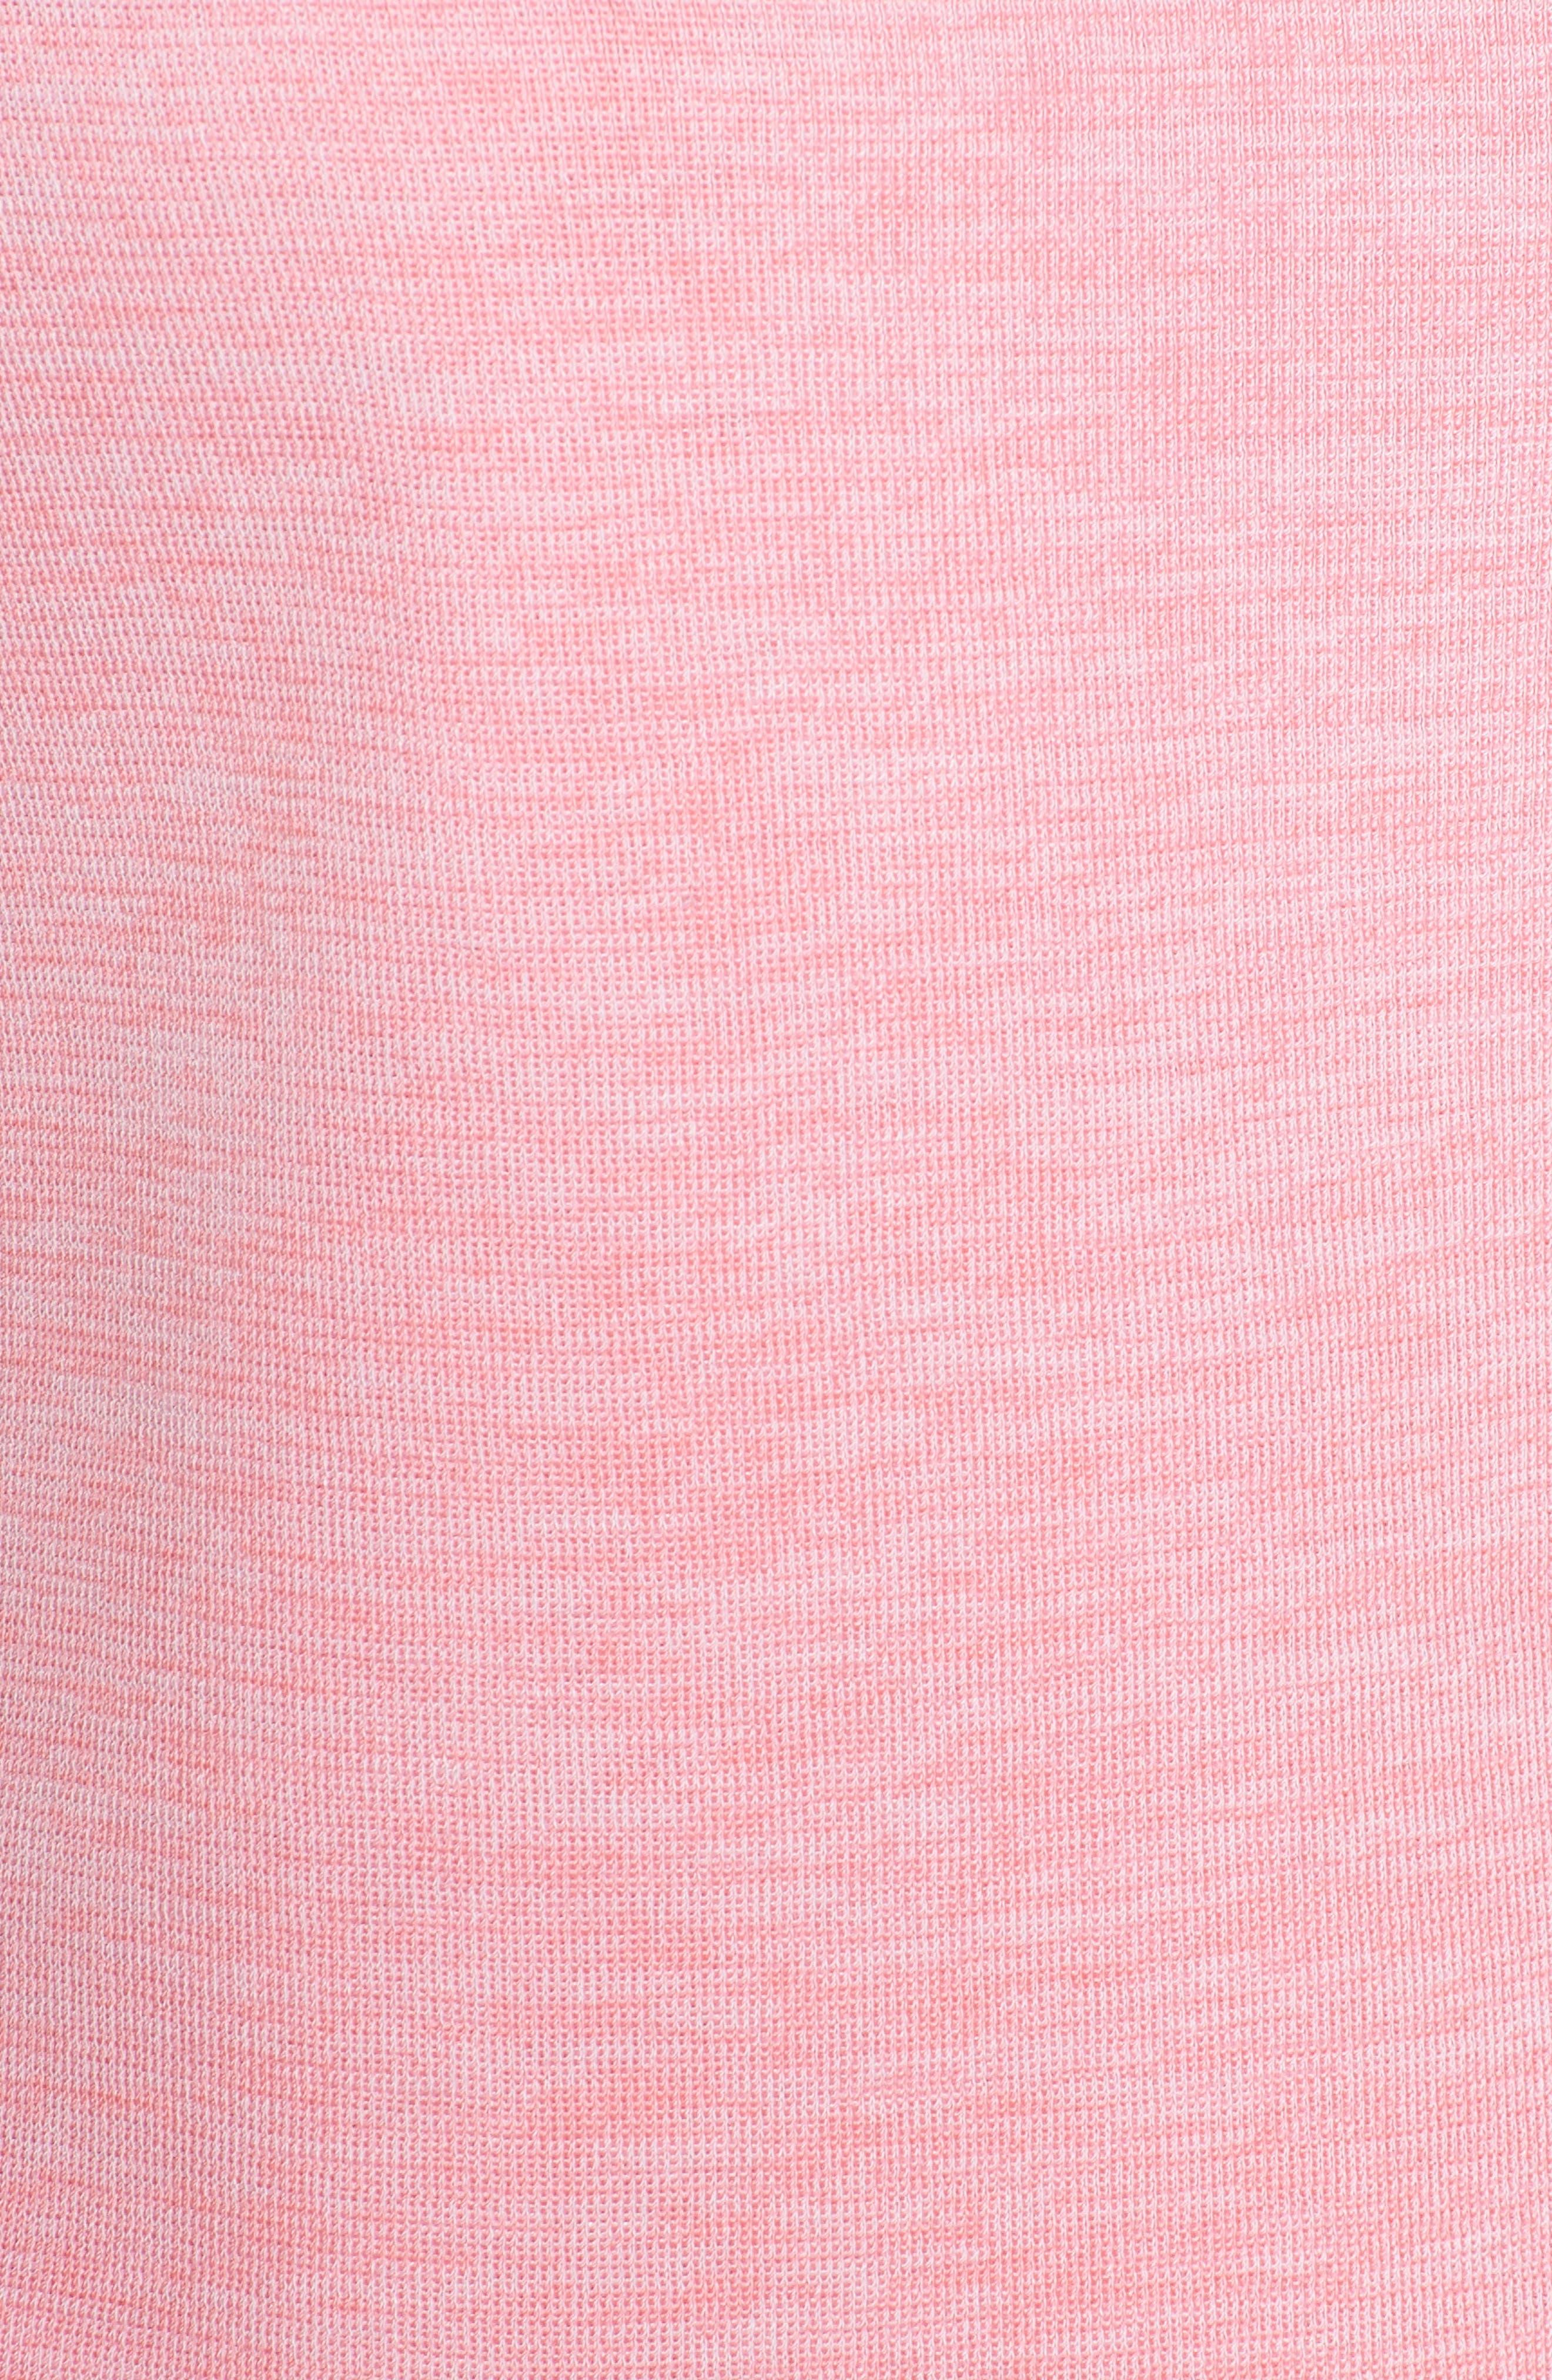 Bateau Neck Tank,                             Alternate thumbnail 5, color,                             White/ Pink Lemonade